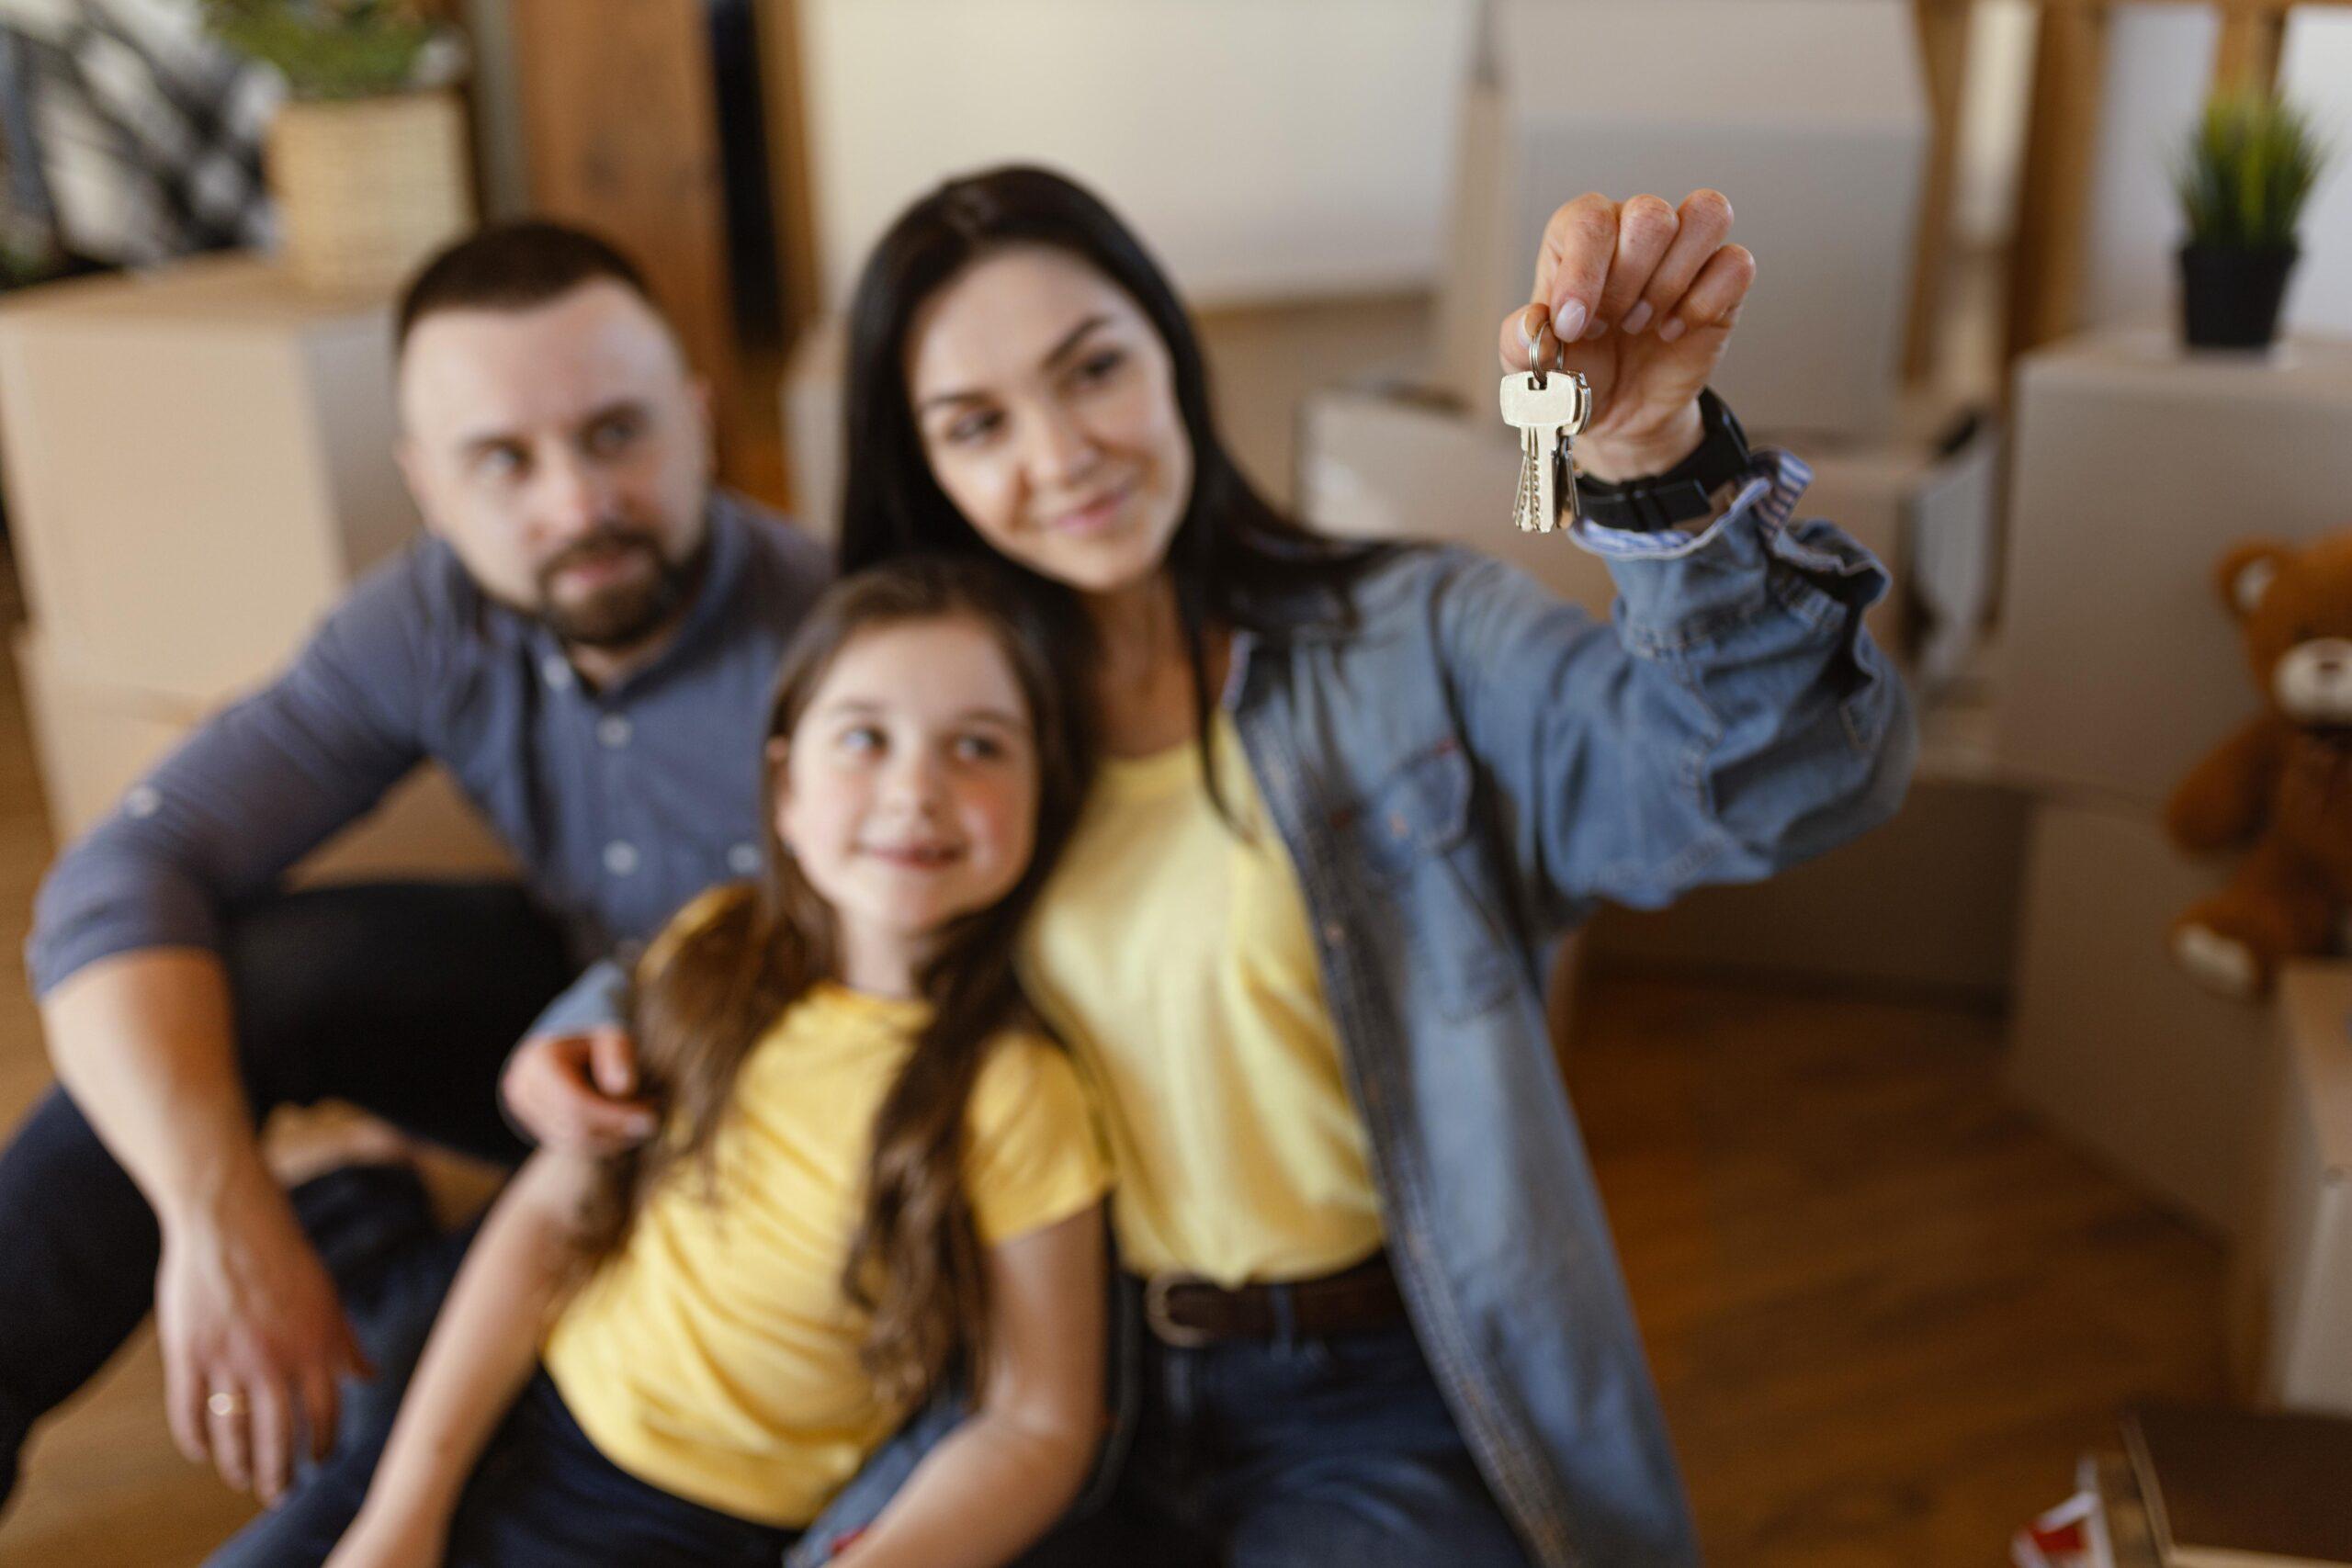 medium-shot-woman-holding-keys